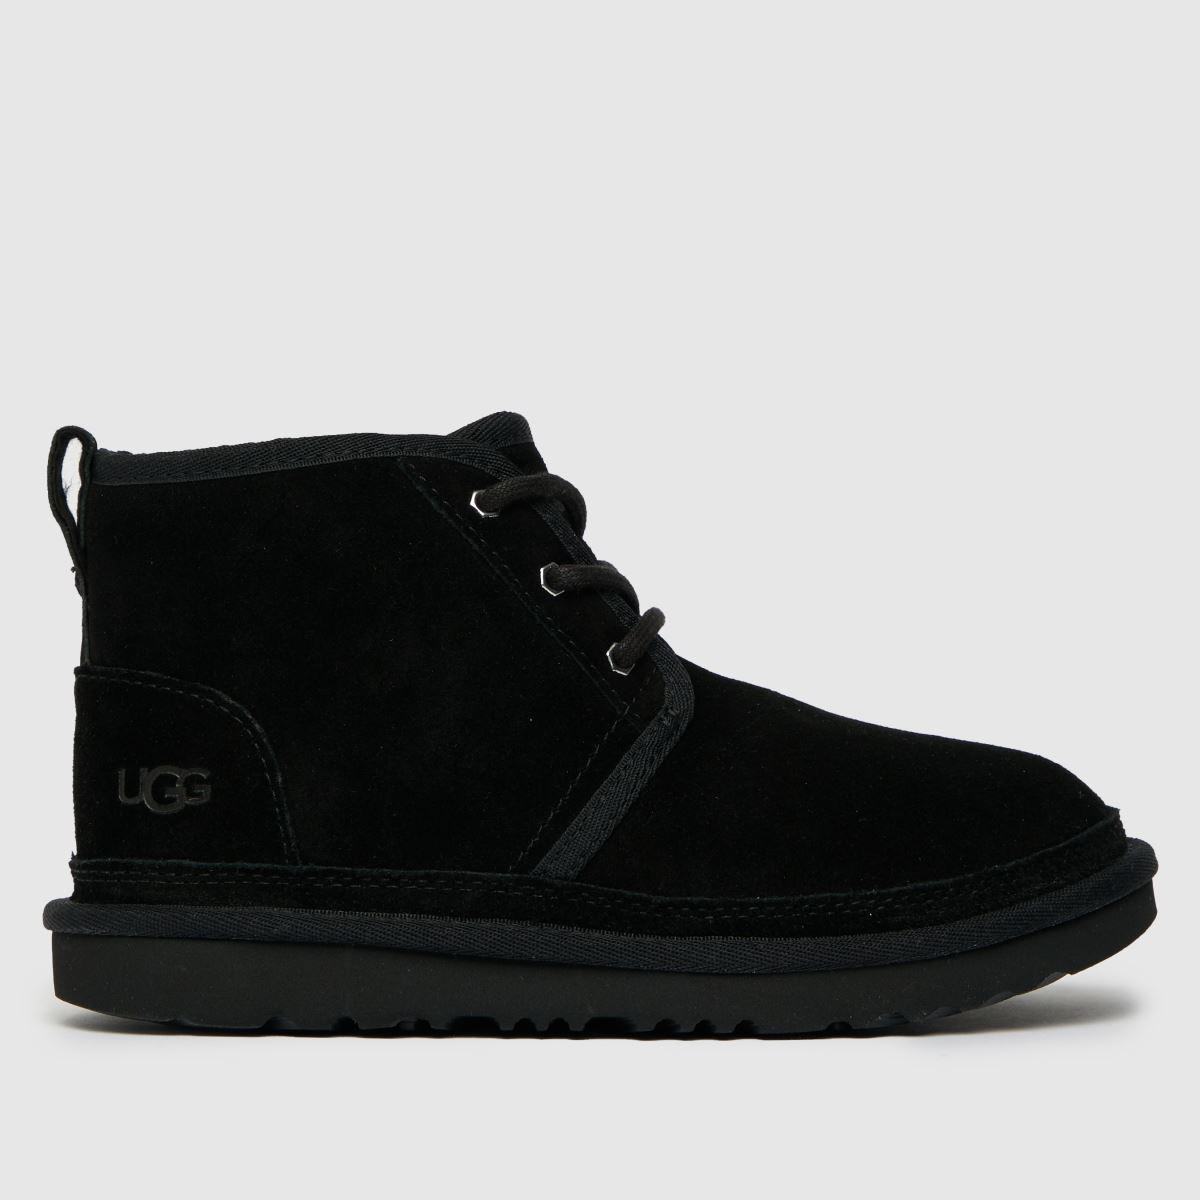 UGG Black Neumel Ii Boots Junior